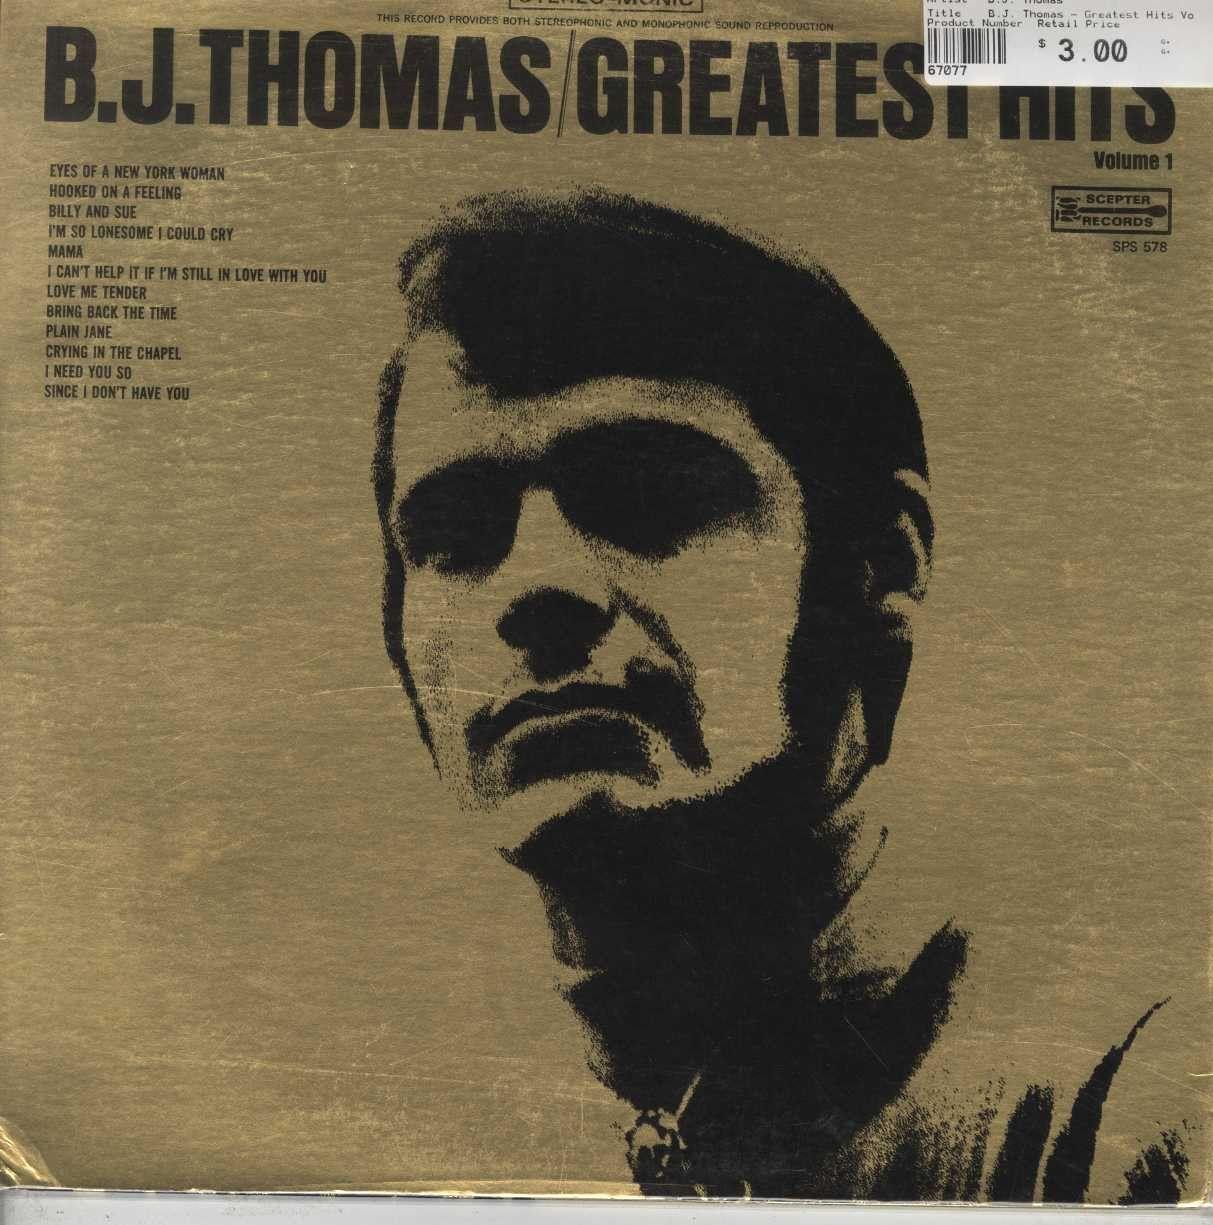 B.J. Thomas - Greatest Hits Volume 1